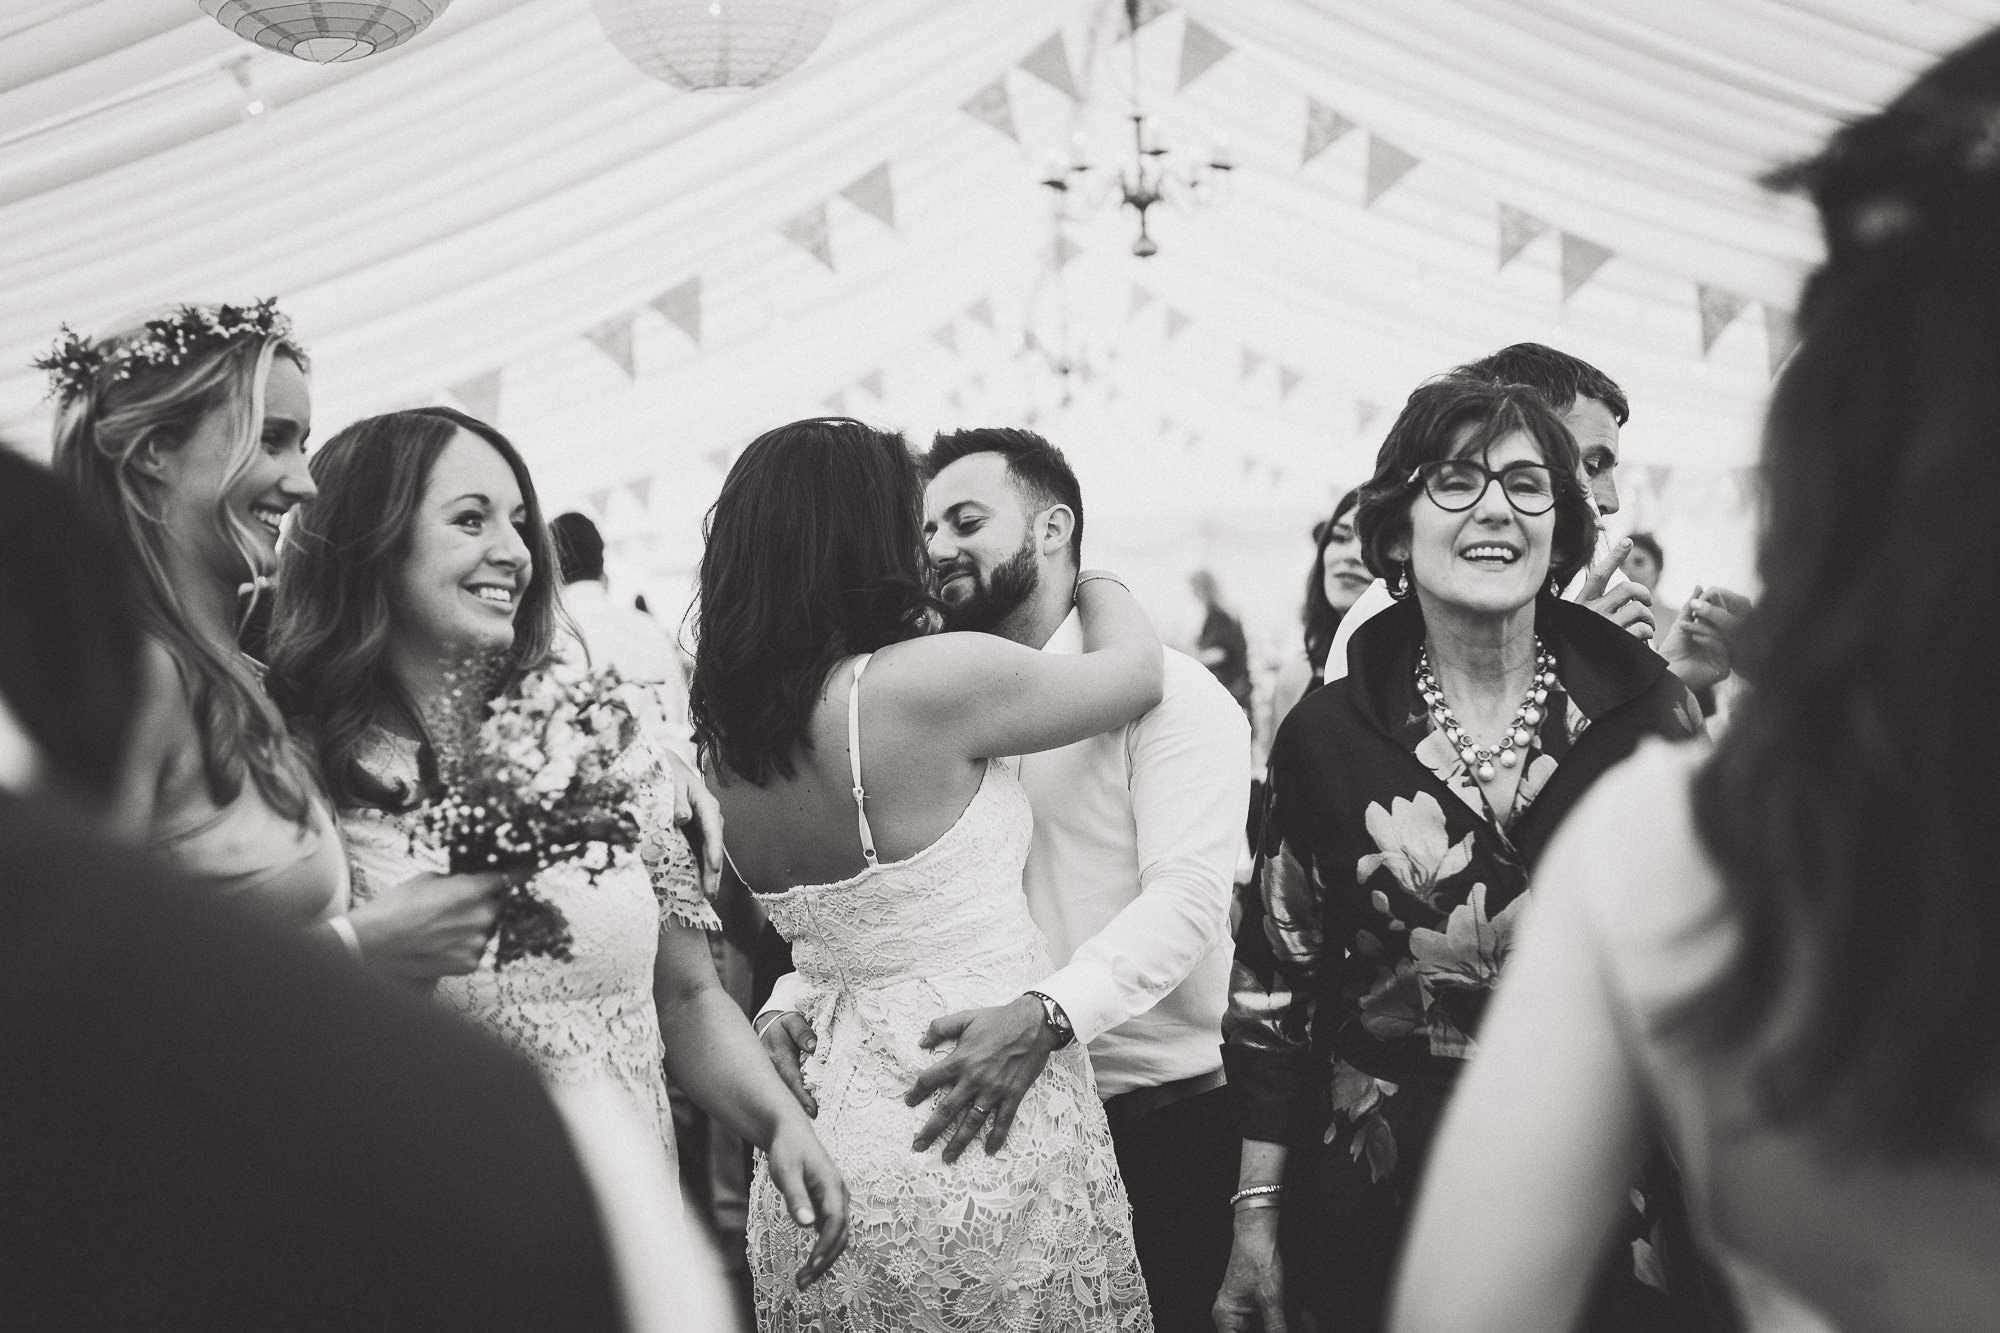 Veils & Bales Wedding Photography | Charlie & Steve SCSS 262